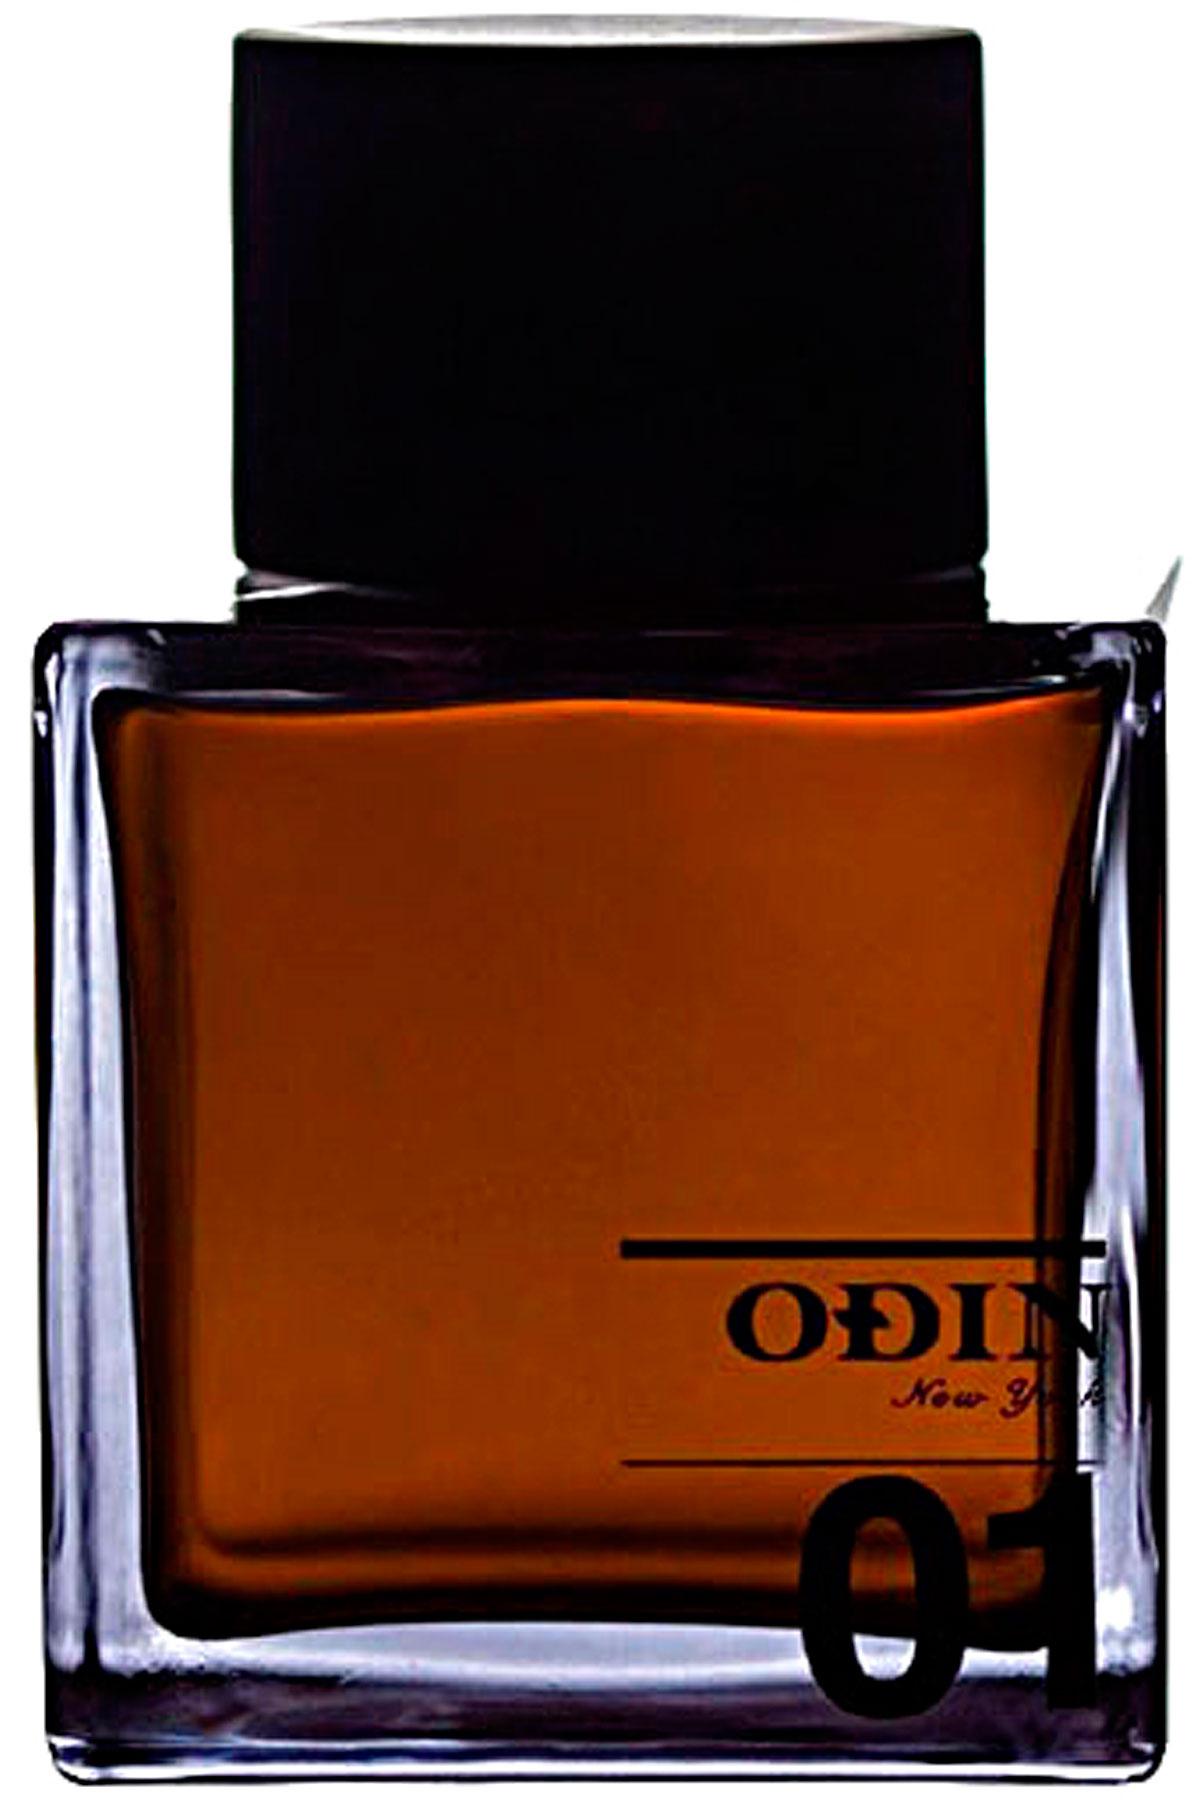 Odin New York Fragrances for Women On Sale, 01 Sunda - Eau De Parfum - 100 Ml, 2019, 100 ml